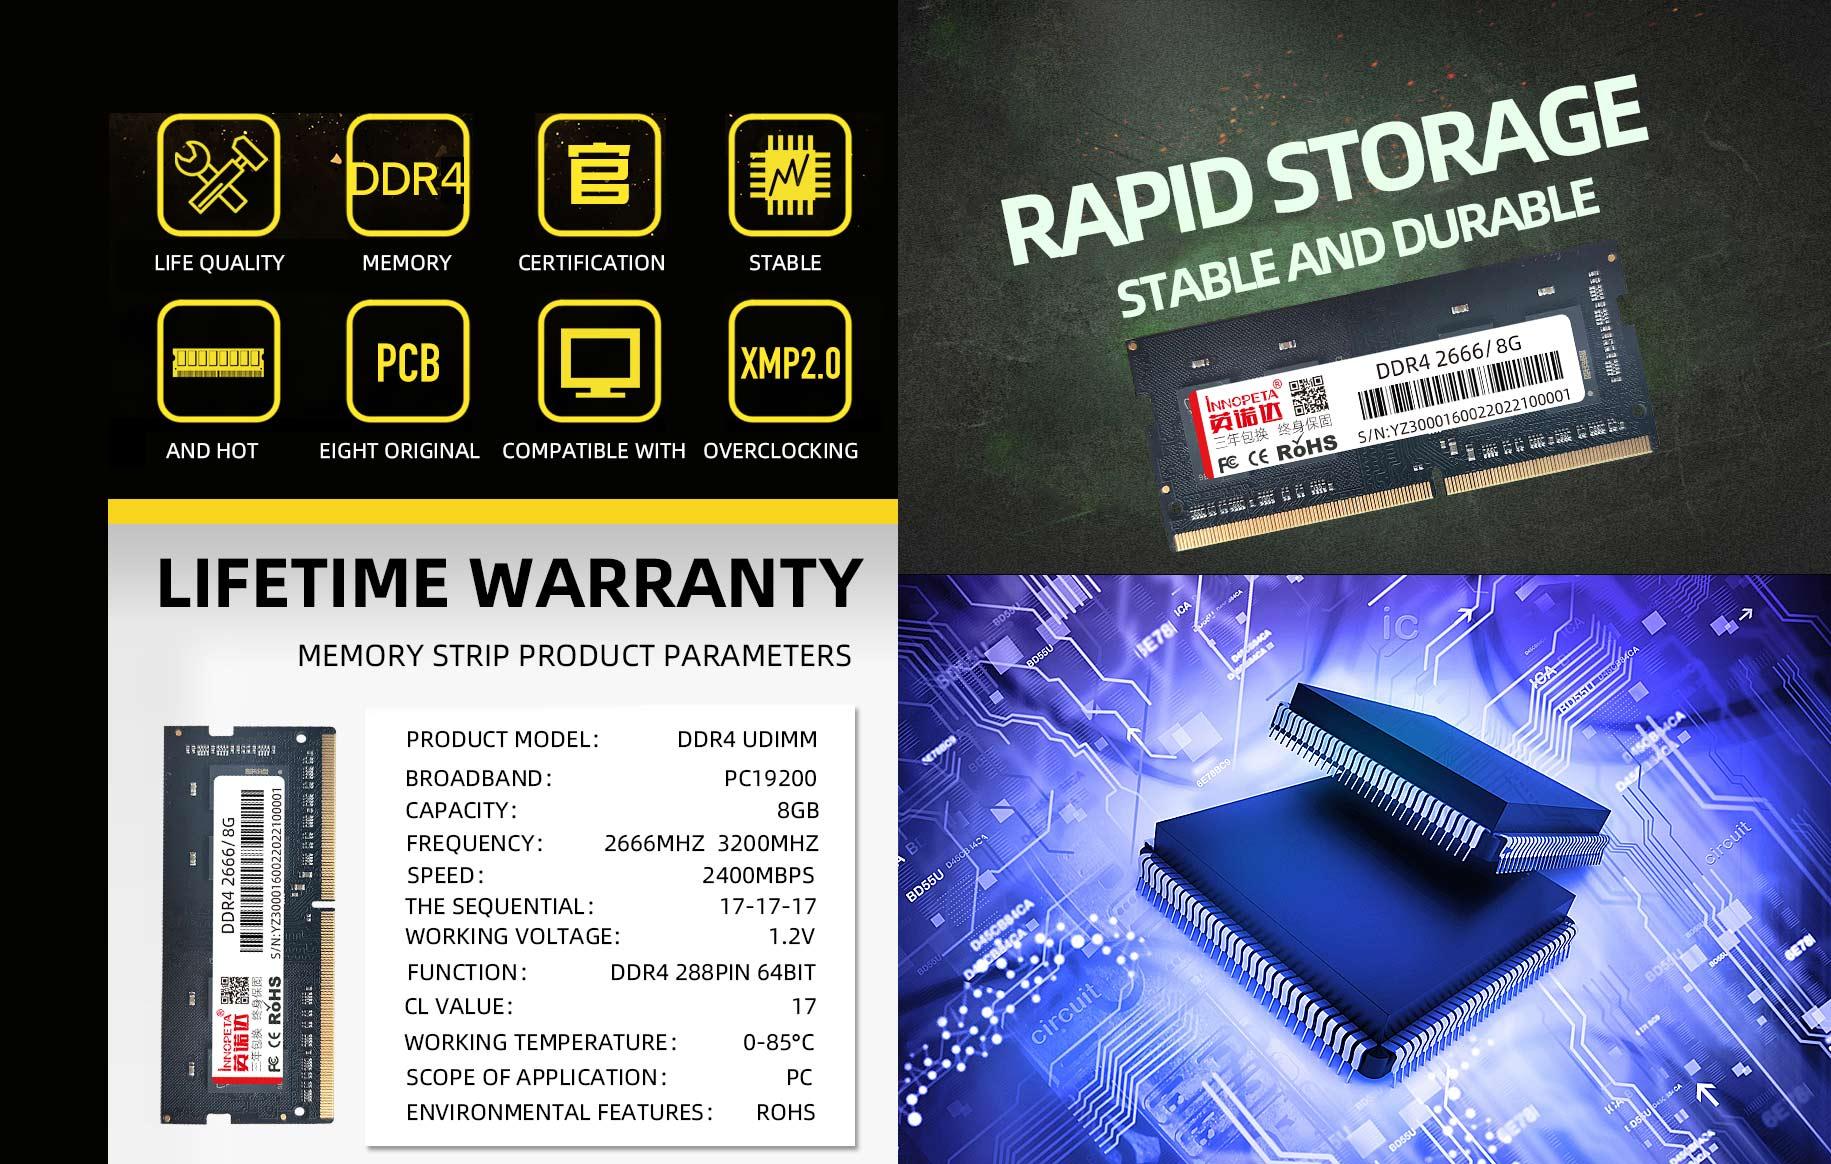 DDR4 2666/3200 8GB notebook memory strip